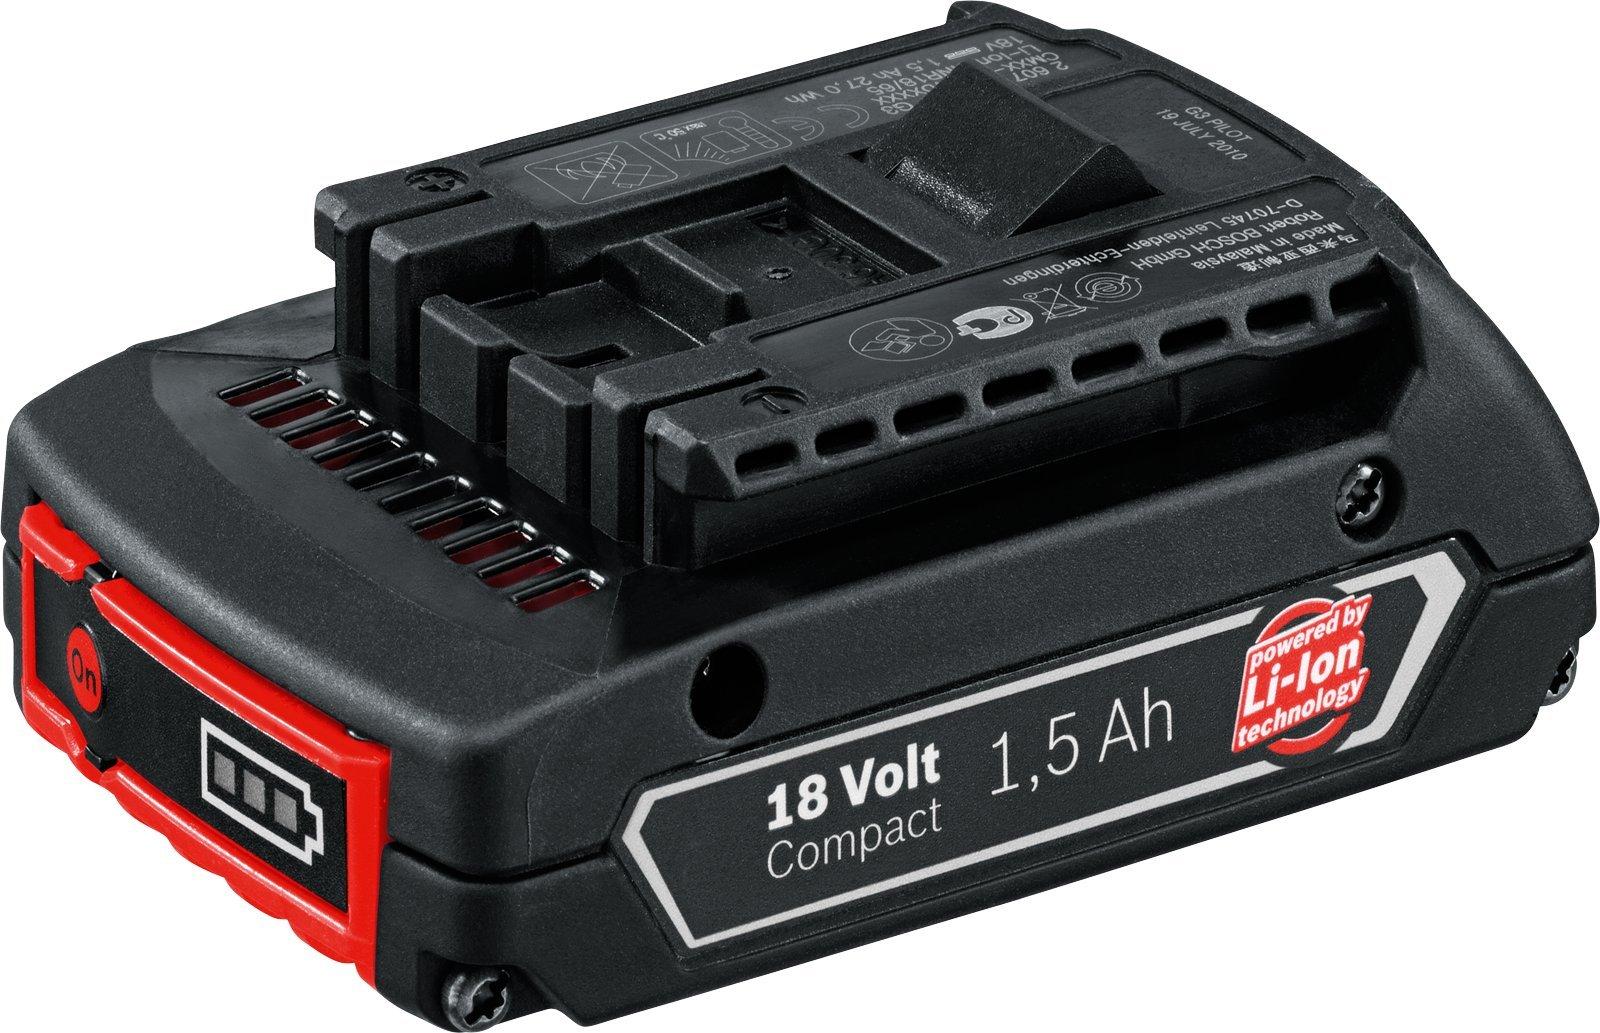 Bosch-Professional-GBH-18-V-LI-Compact-Akku-Bohrhammer-mit-2-x-30-Ah-Li-Ion-Schlagenergie-1-J-19-kg-L-BOXX-1-Stck-0611905303